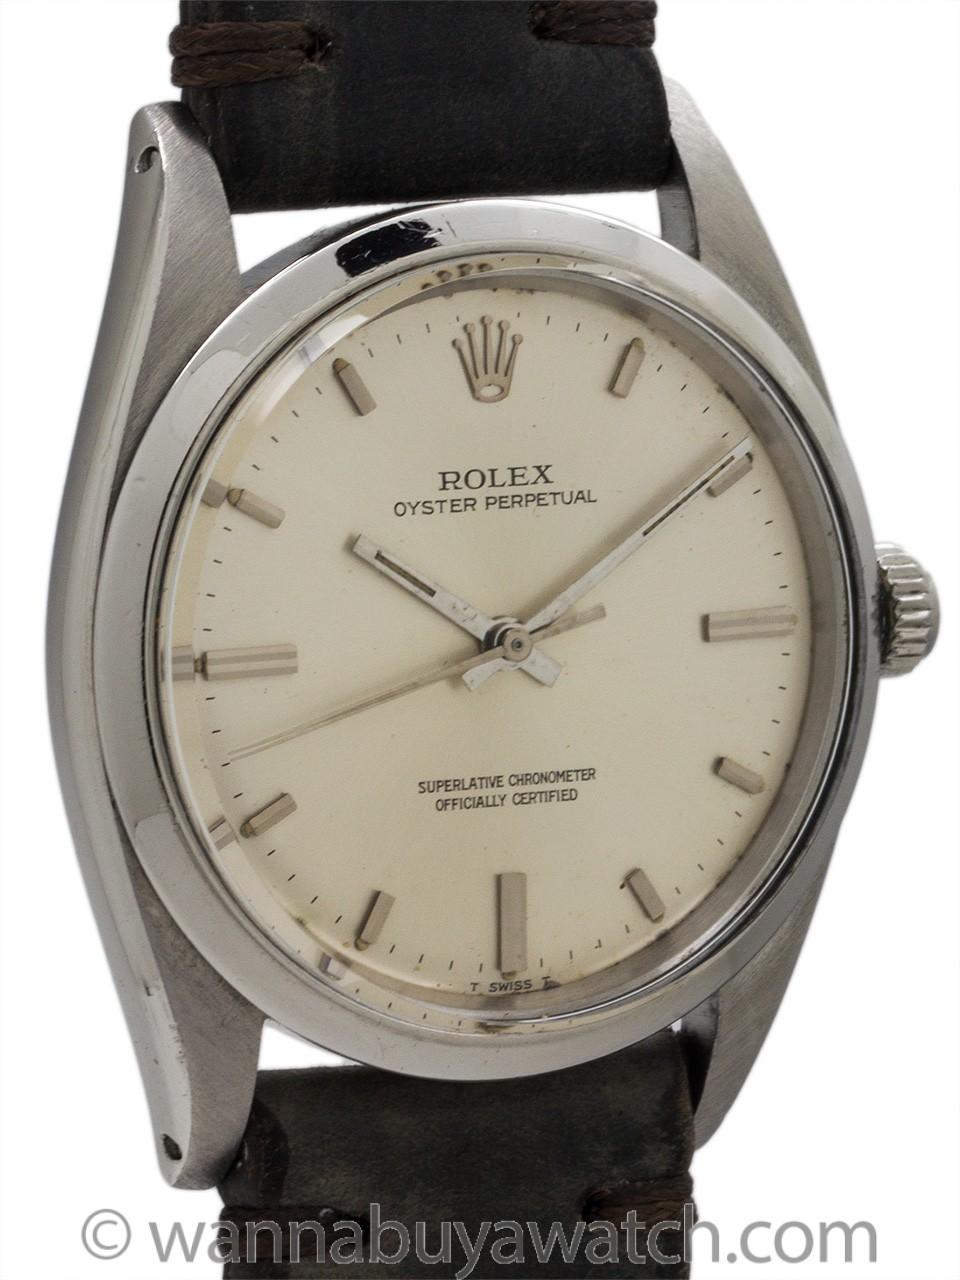 Rolex Oyster Perpetual ref 1018 circa 1962